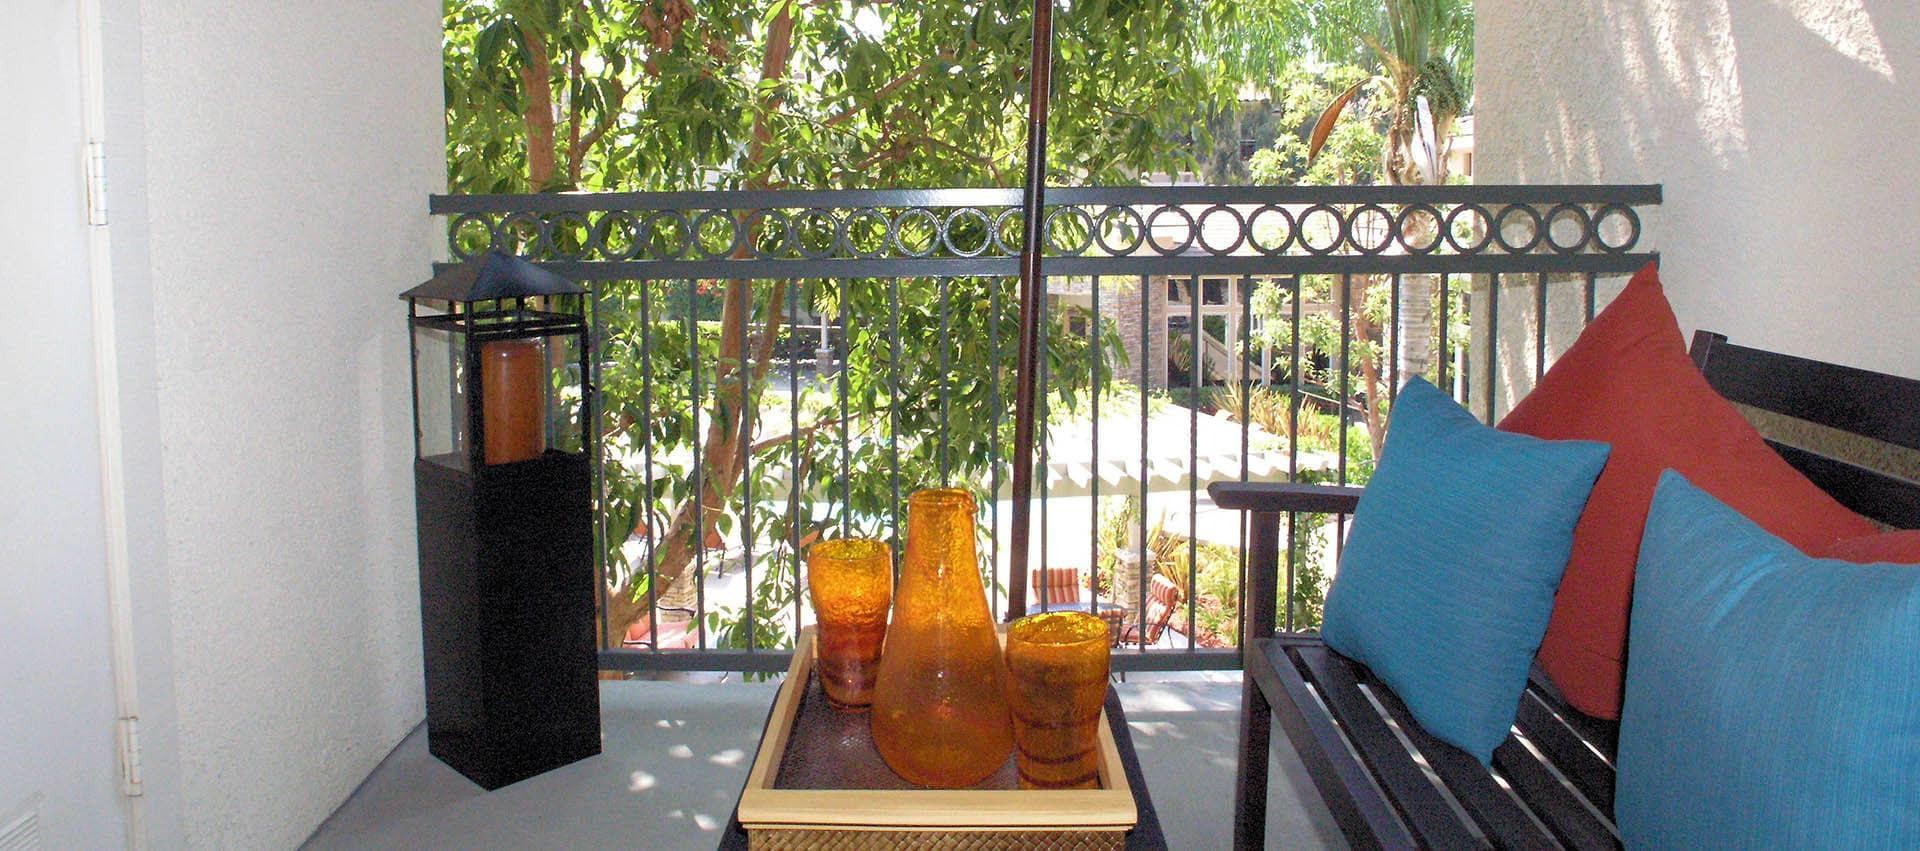 Balcony Seating Area in Aliso Viejo, CA